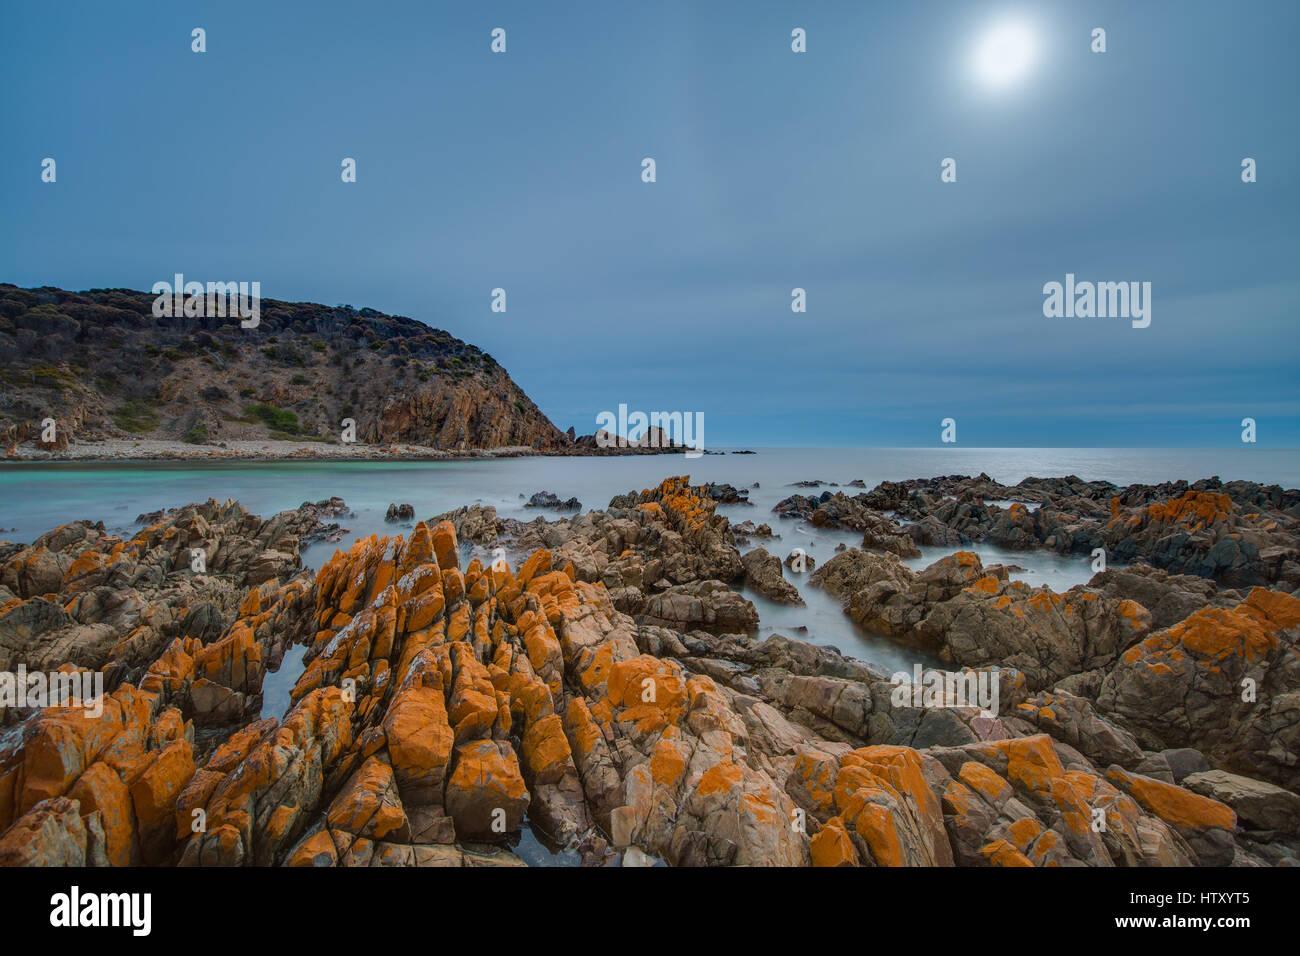 King George Beach - Kangaroo Island, South Australia Stock Photo